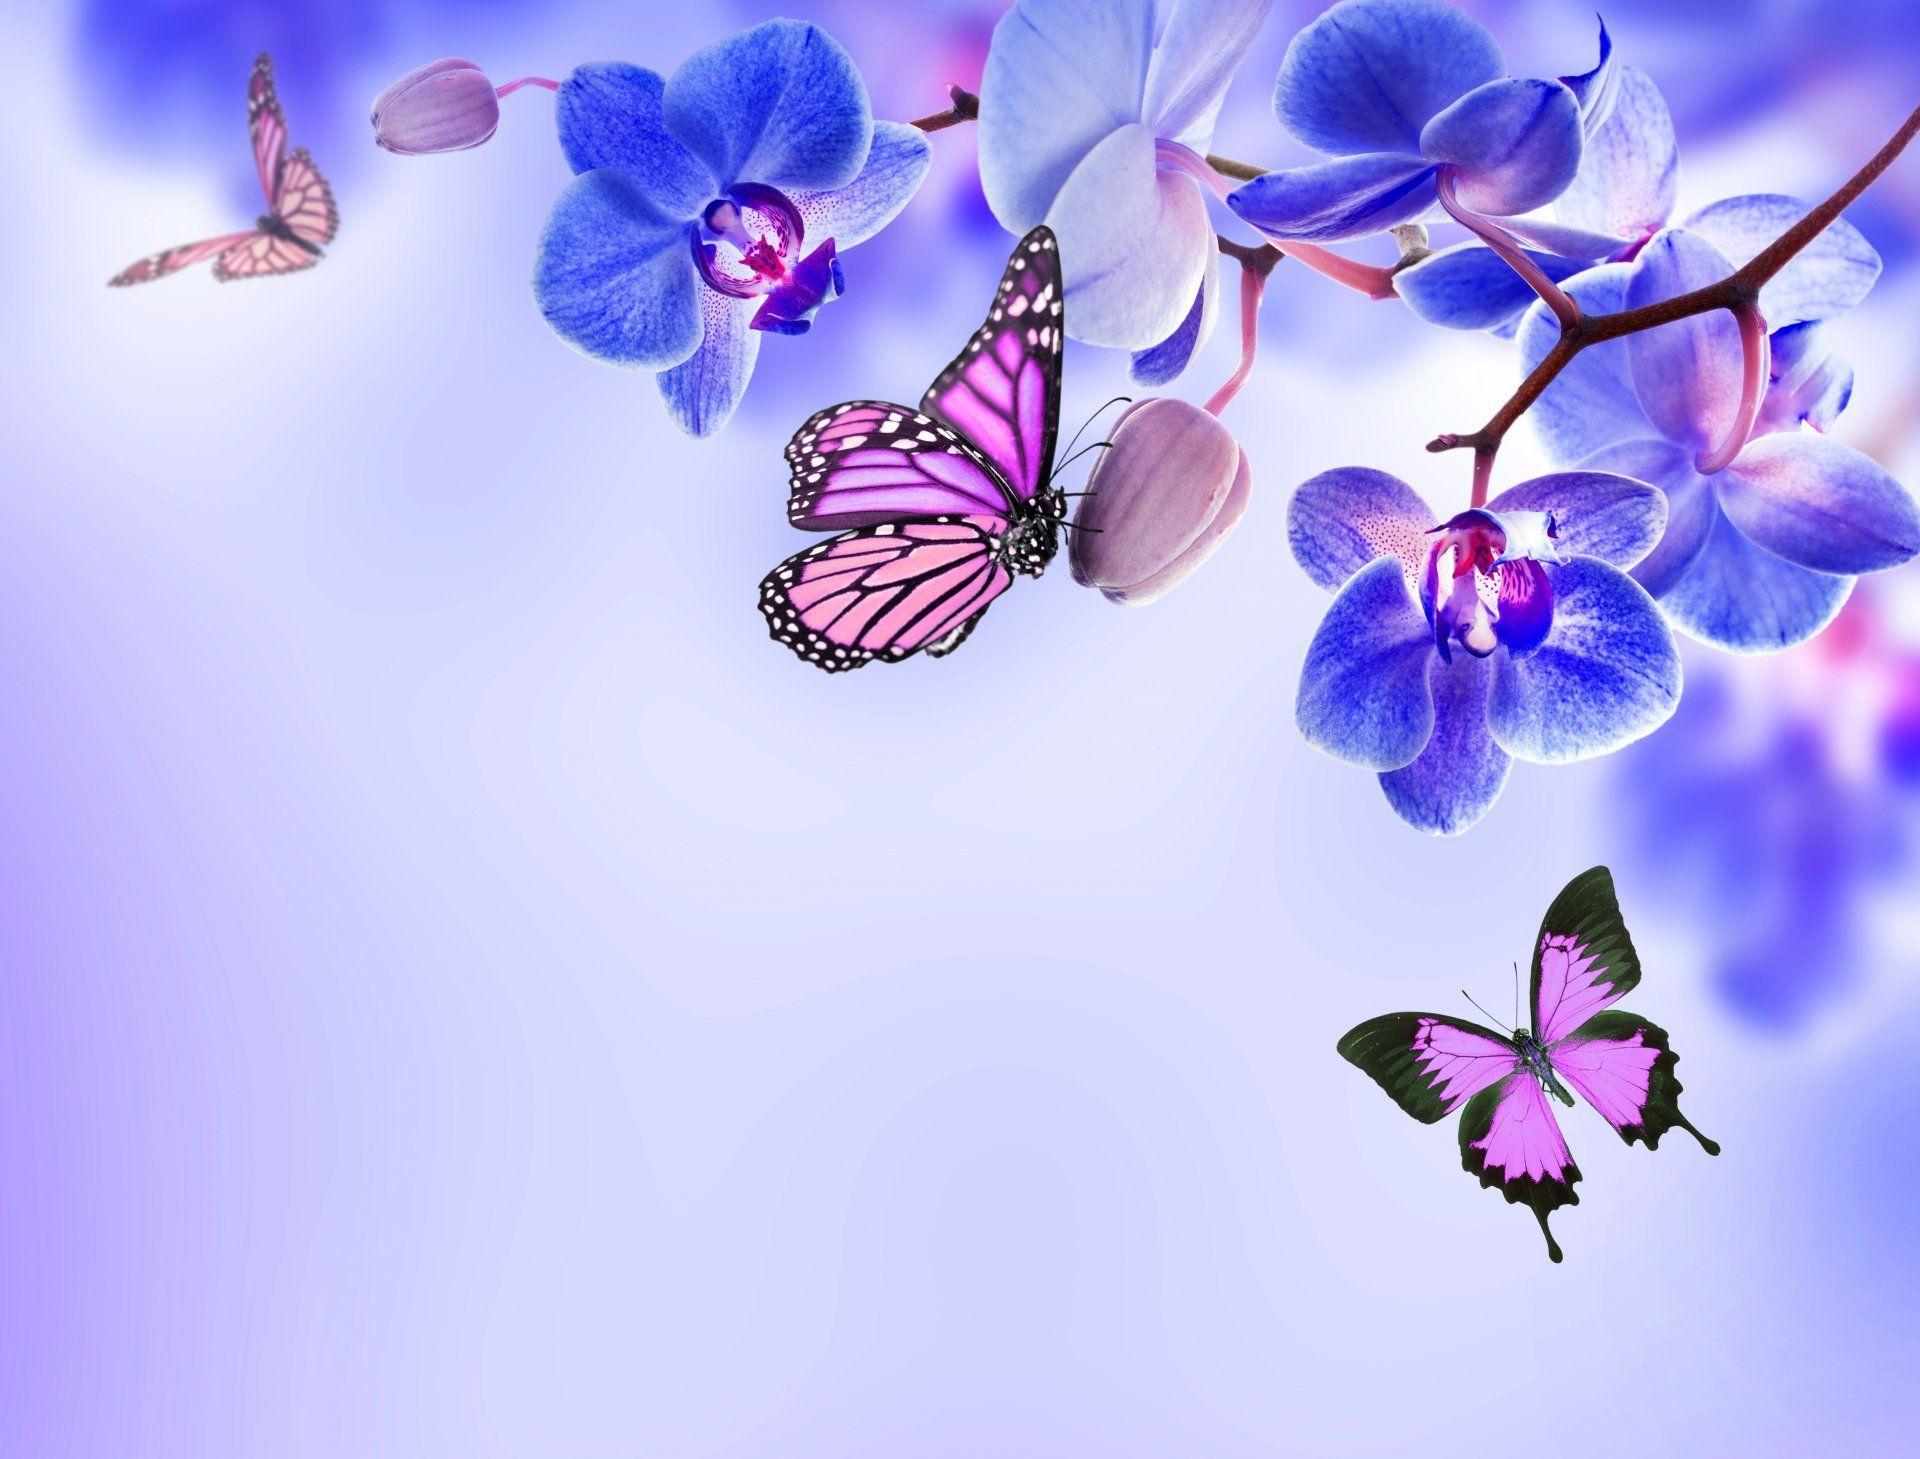 Orchid Blue Flowers Beautiful Butterflies Flower Butterfly Hd Wallpaper Orchid Wallpaper Butterfly Wallpaper Hd Flower Wallpaper